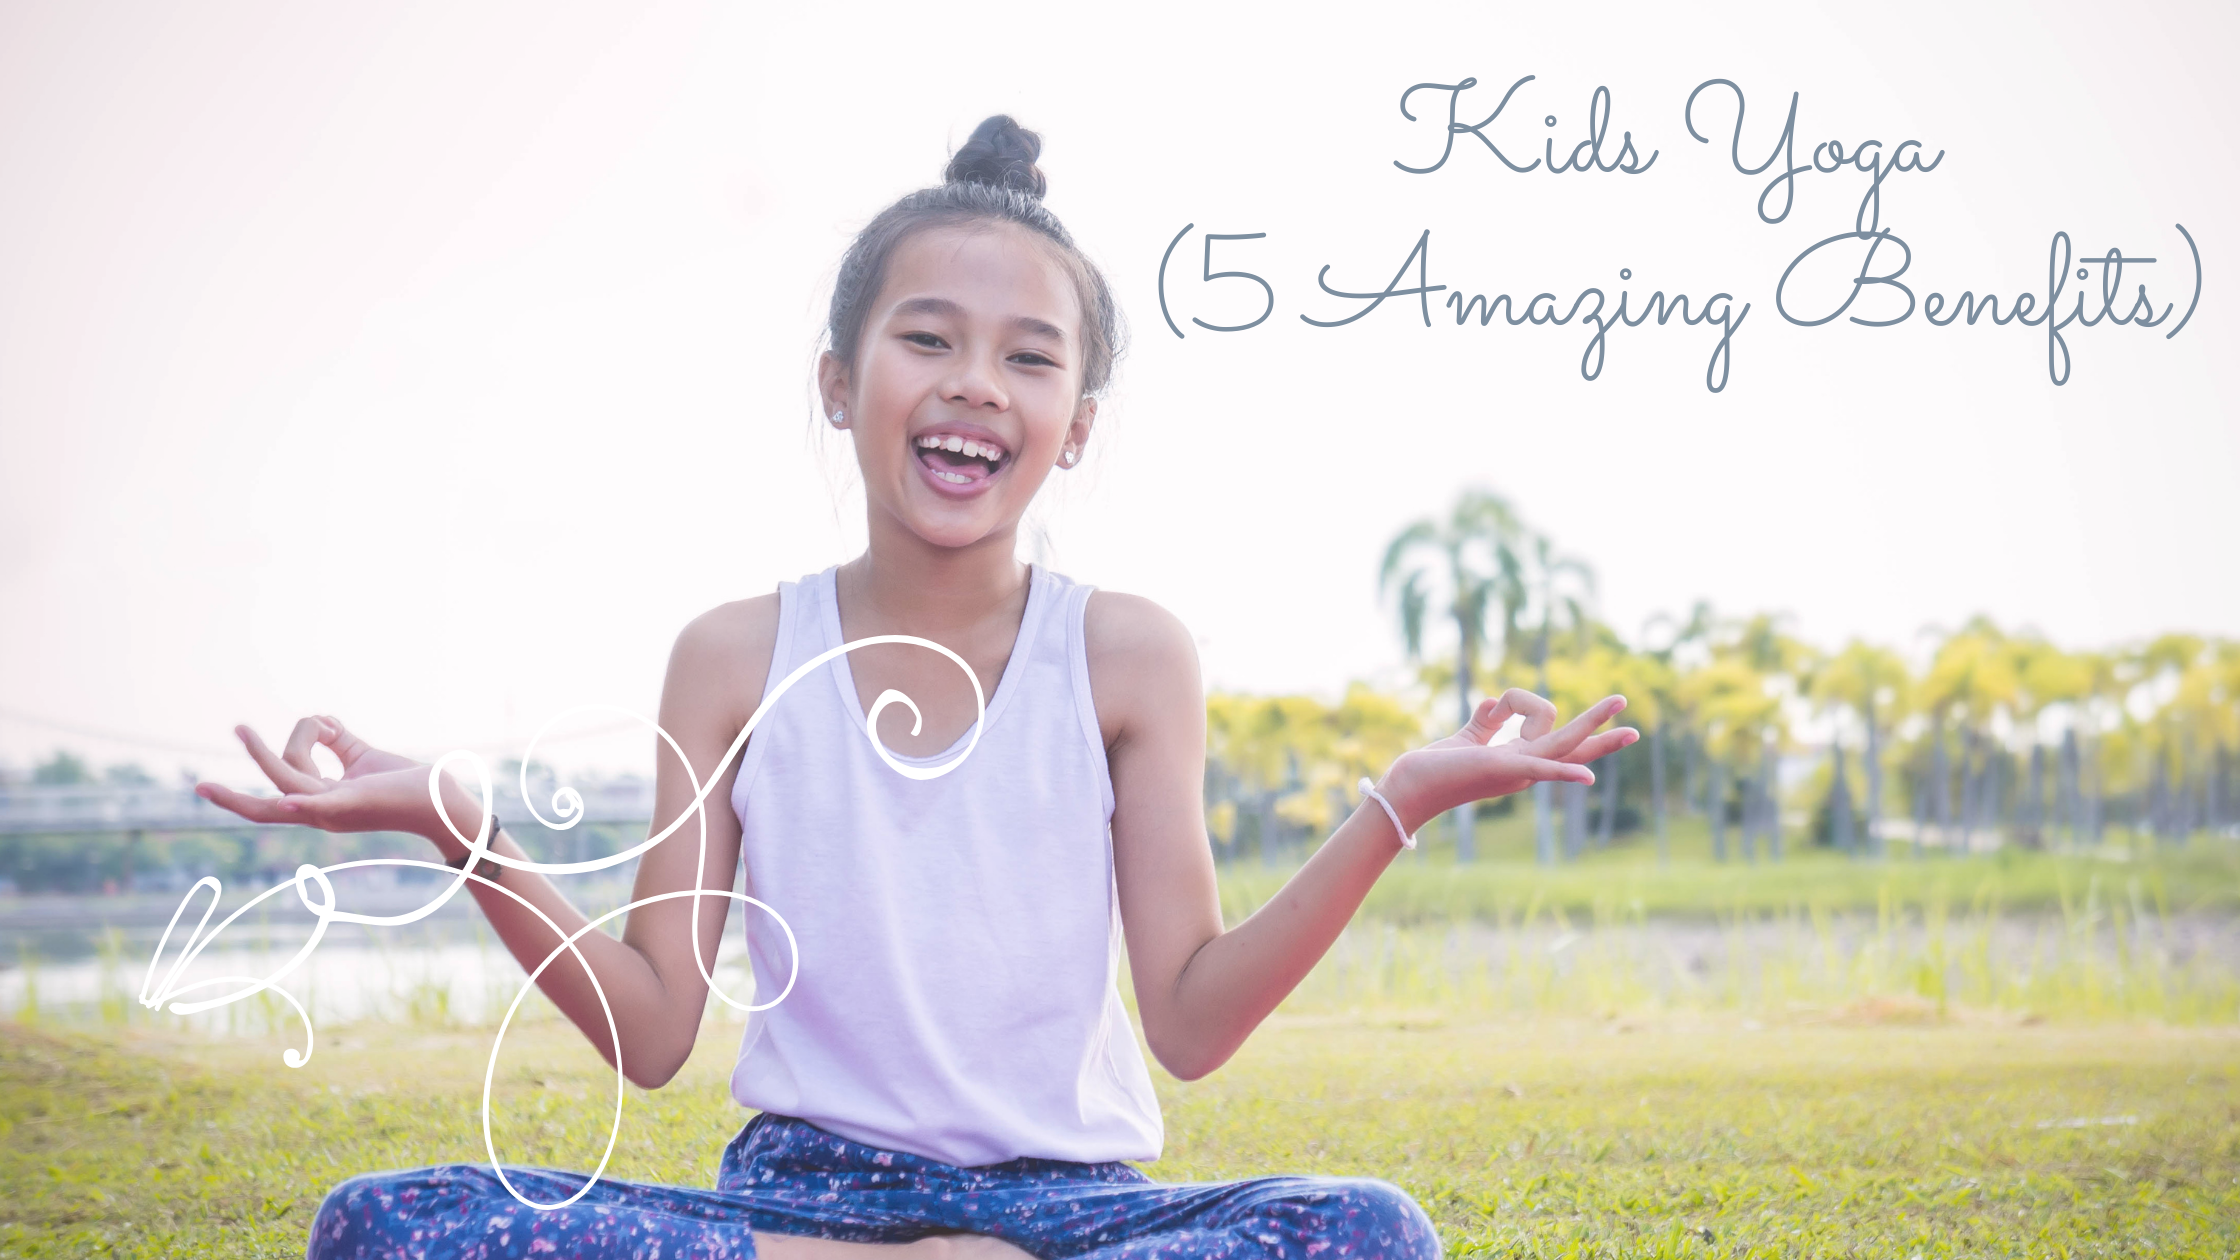 Kids Yoga Benefits blog expert advice Australia girl sitting grass